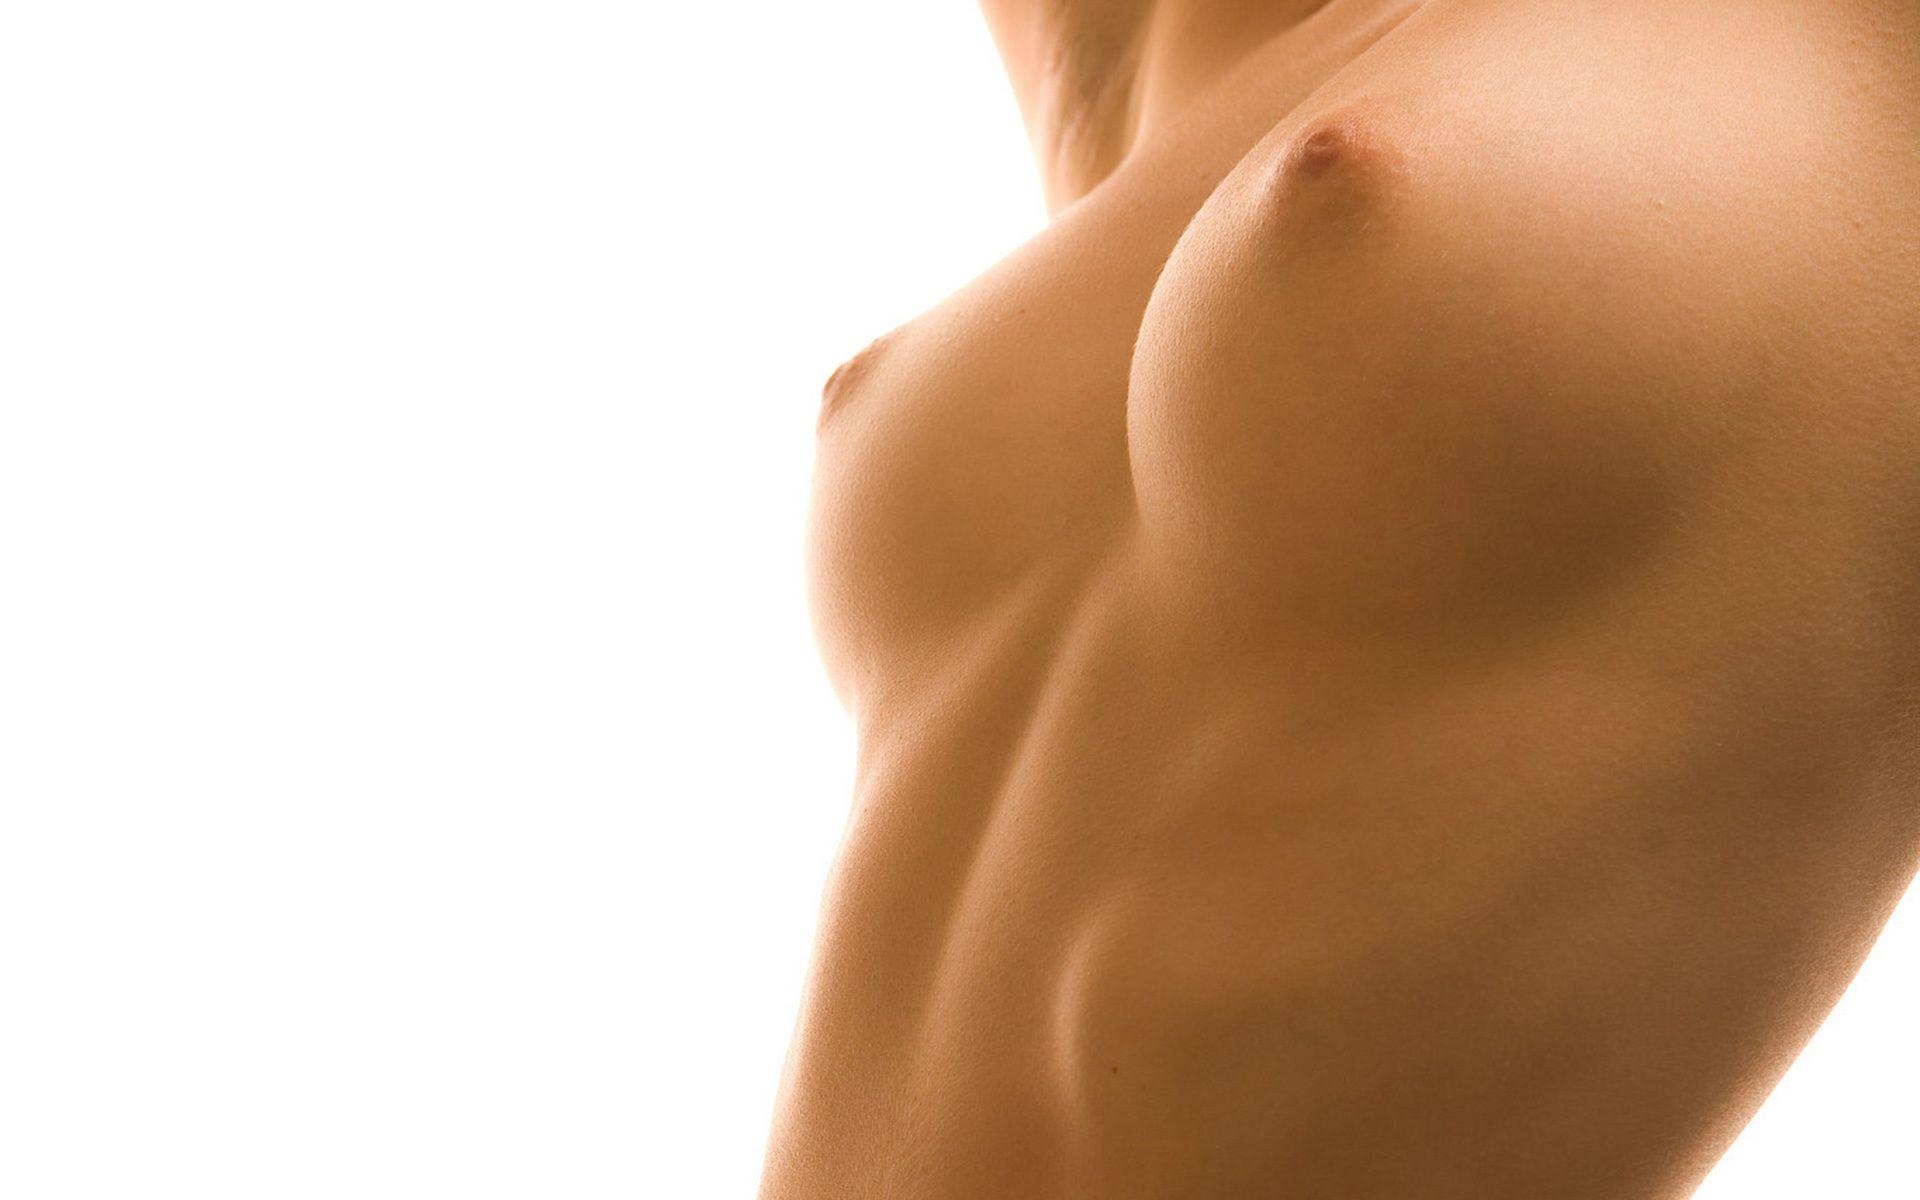 красивая обнаженная грудь hd